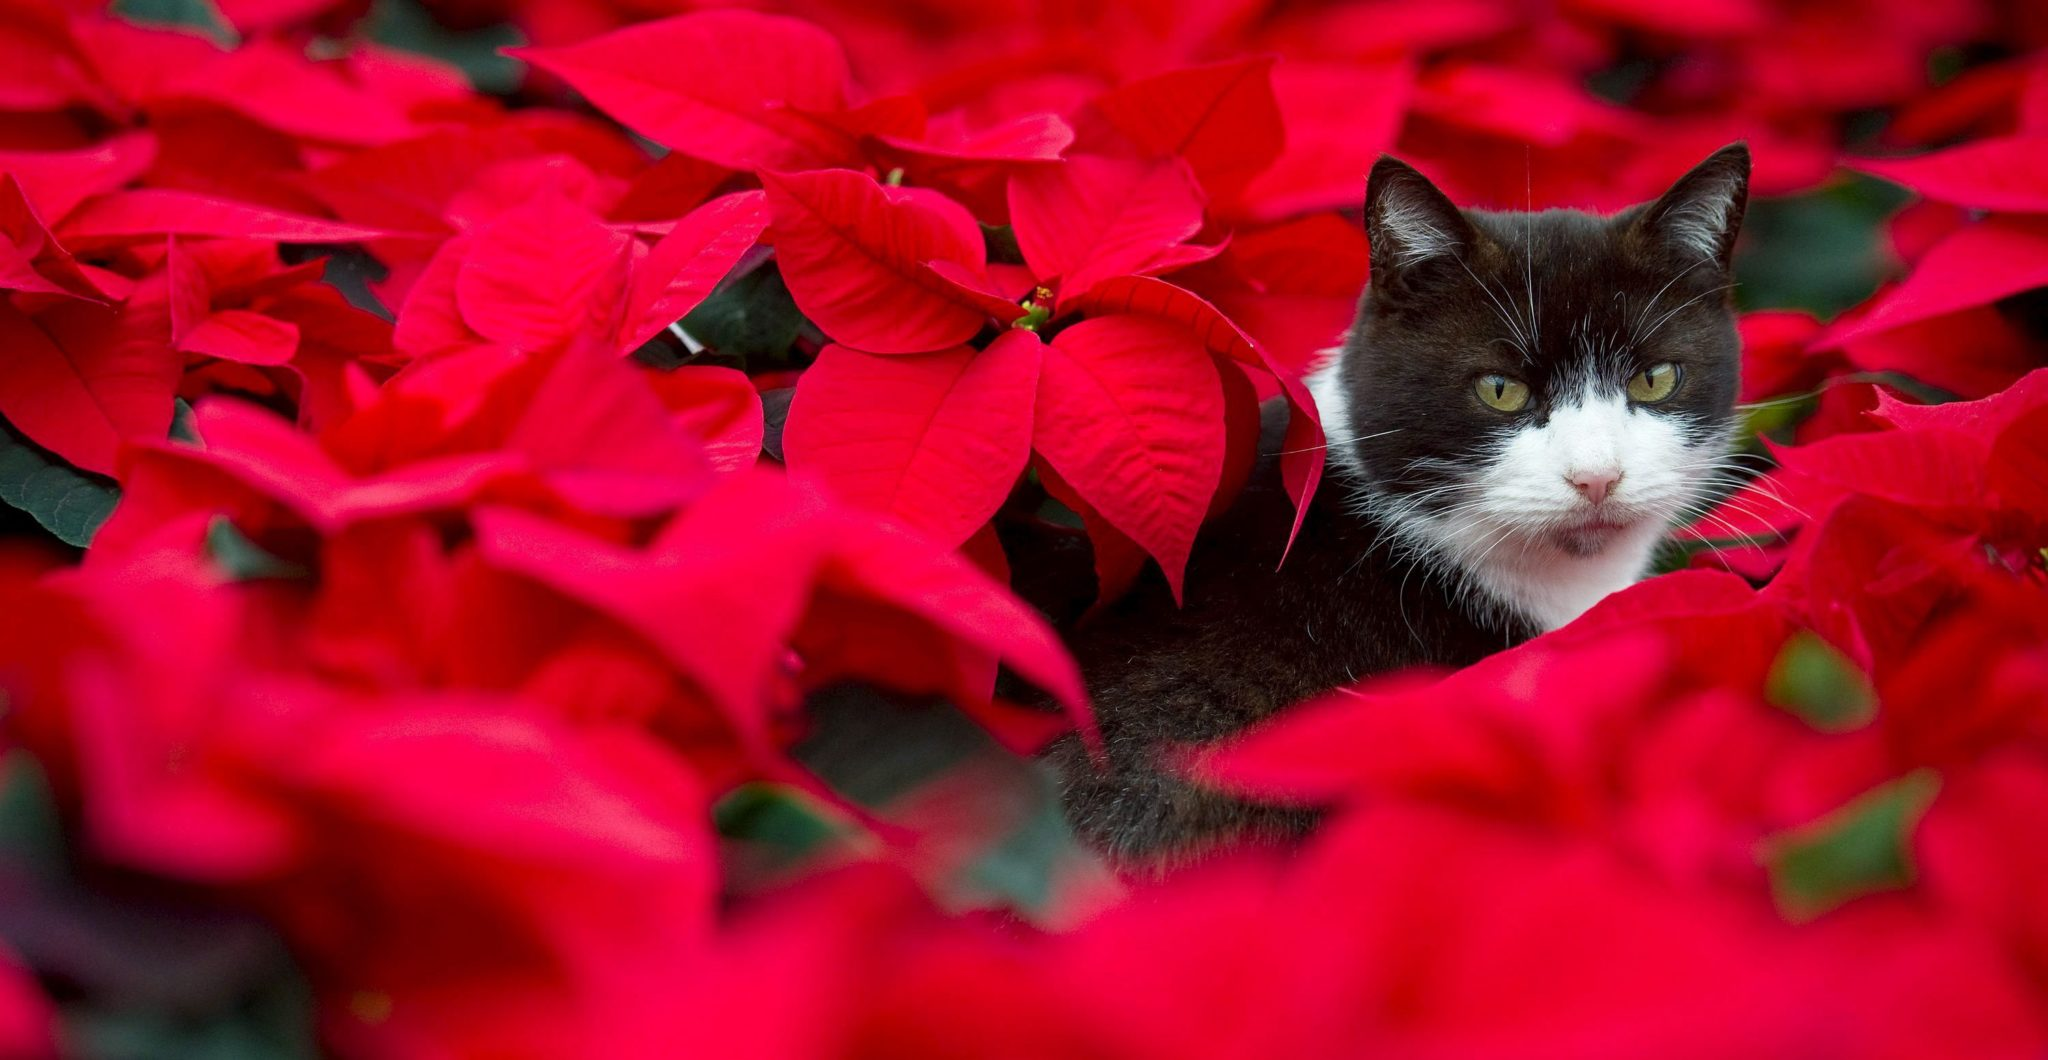 Algunas plantas son tóxicas para gatos